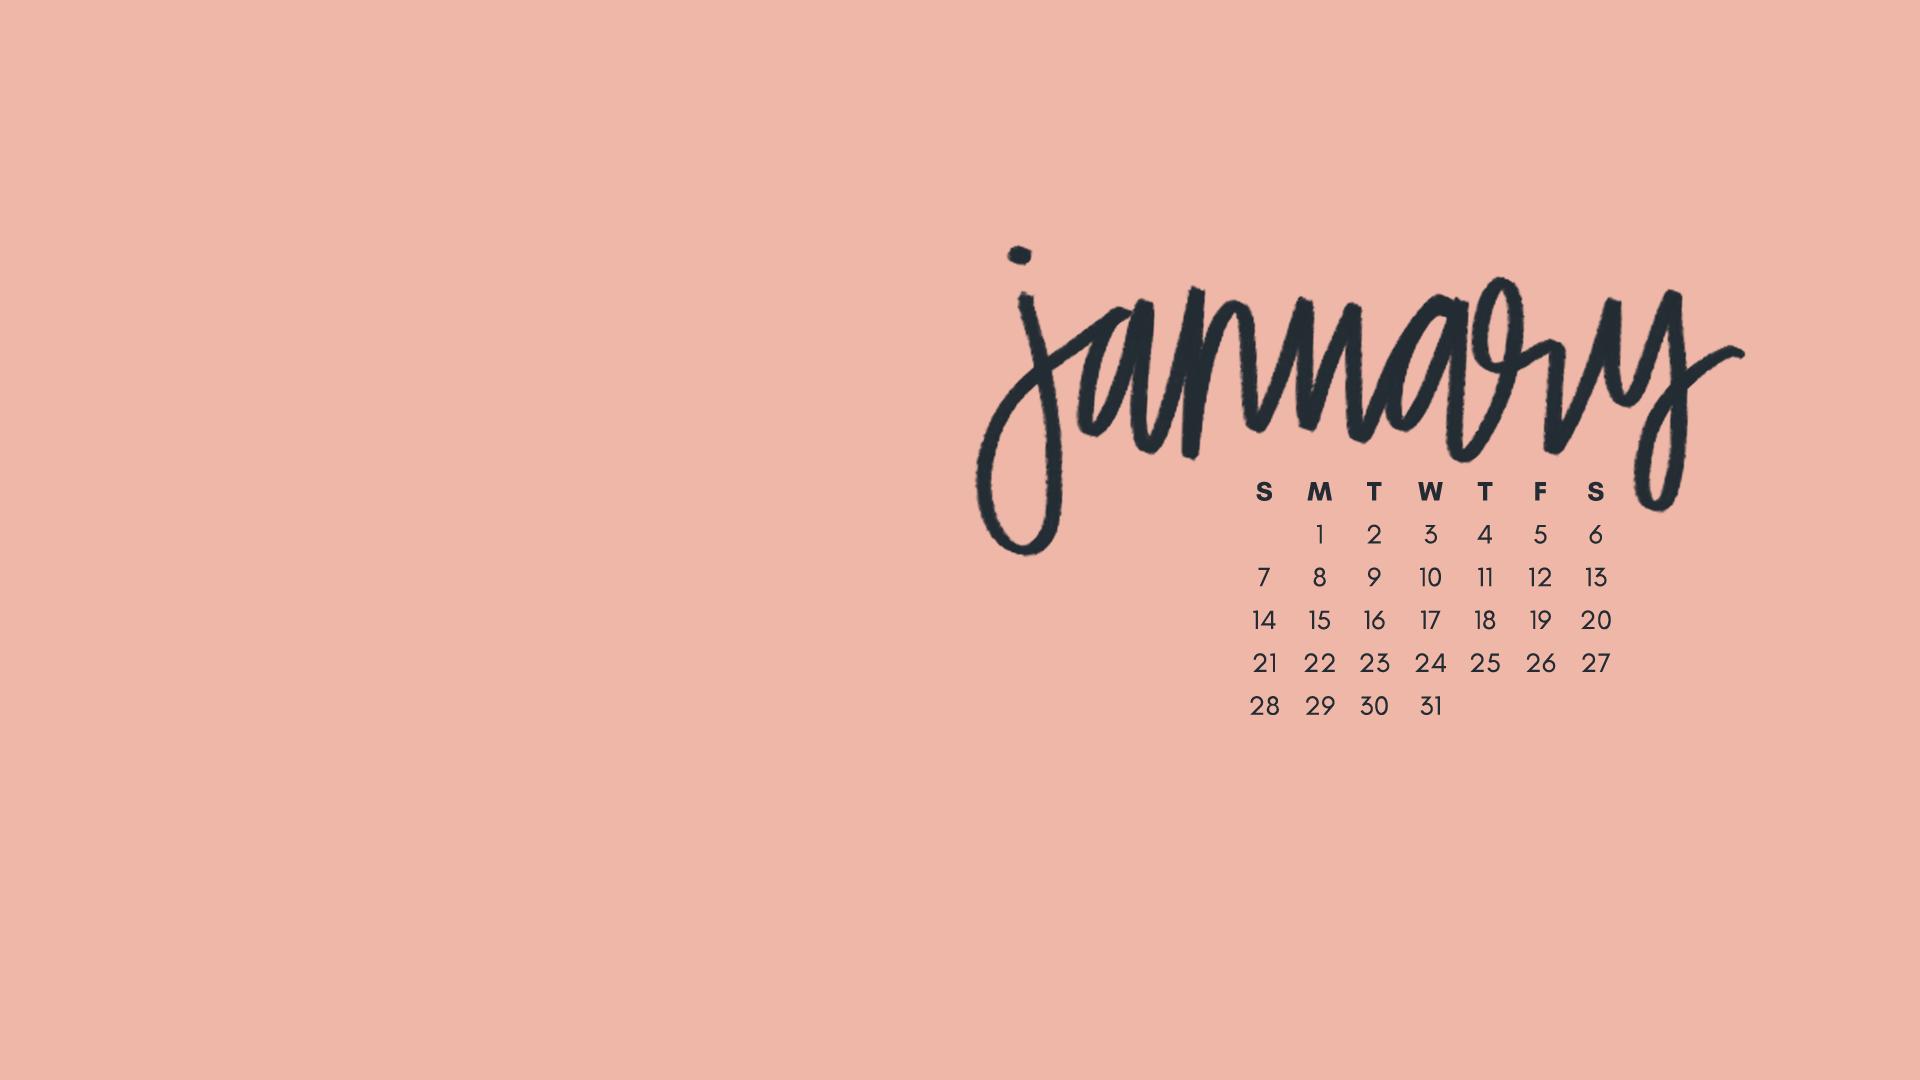 January 2018 Wallpapers Folder Icons Whatever Bright Things January Wallpaper Cute Desktop Wallpaper Calendar Wallpaper